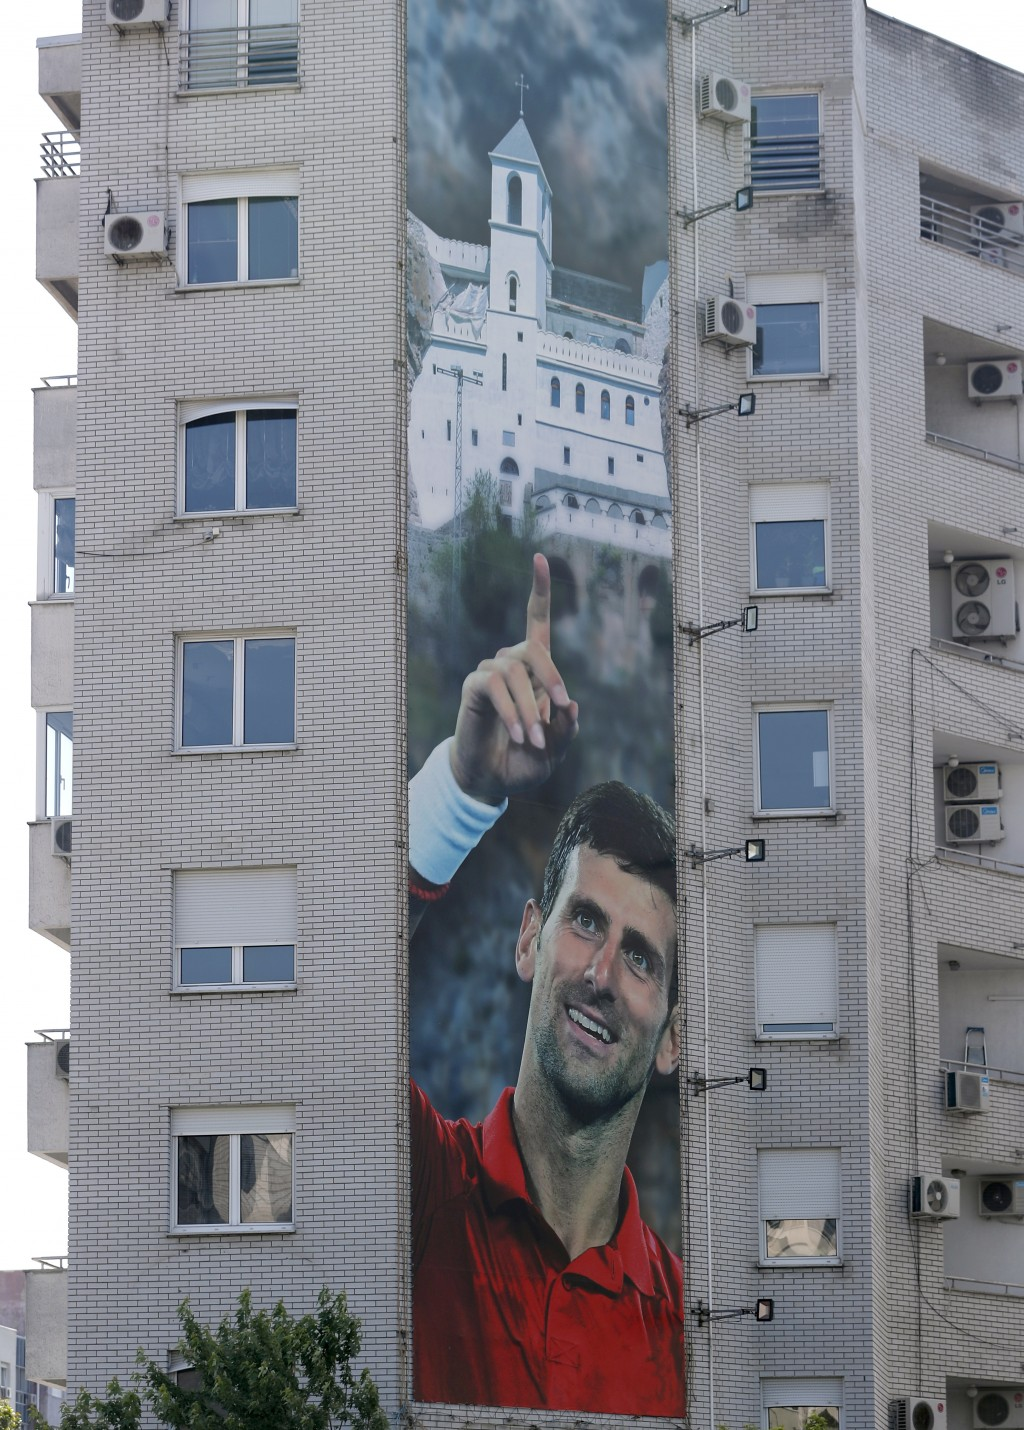 A billboard depicting Serbian tennis player Novak Djokovic and the Christian Orthodox monastery of Ostrog is seen on a building in Belgrade, Serbia, W...